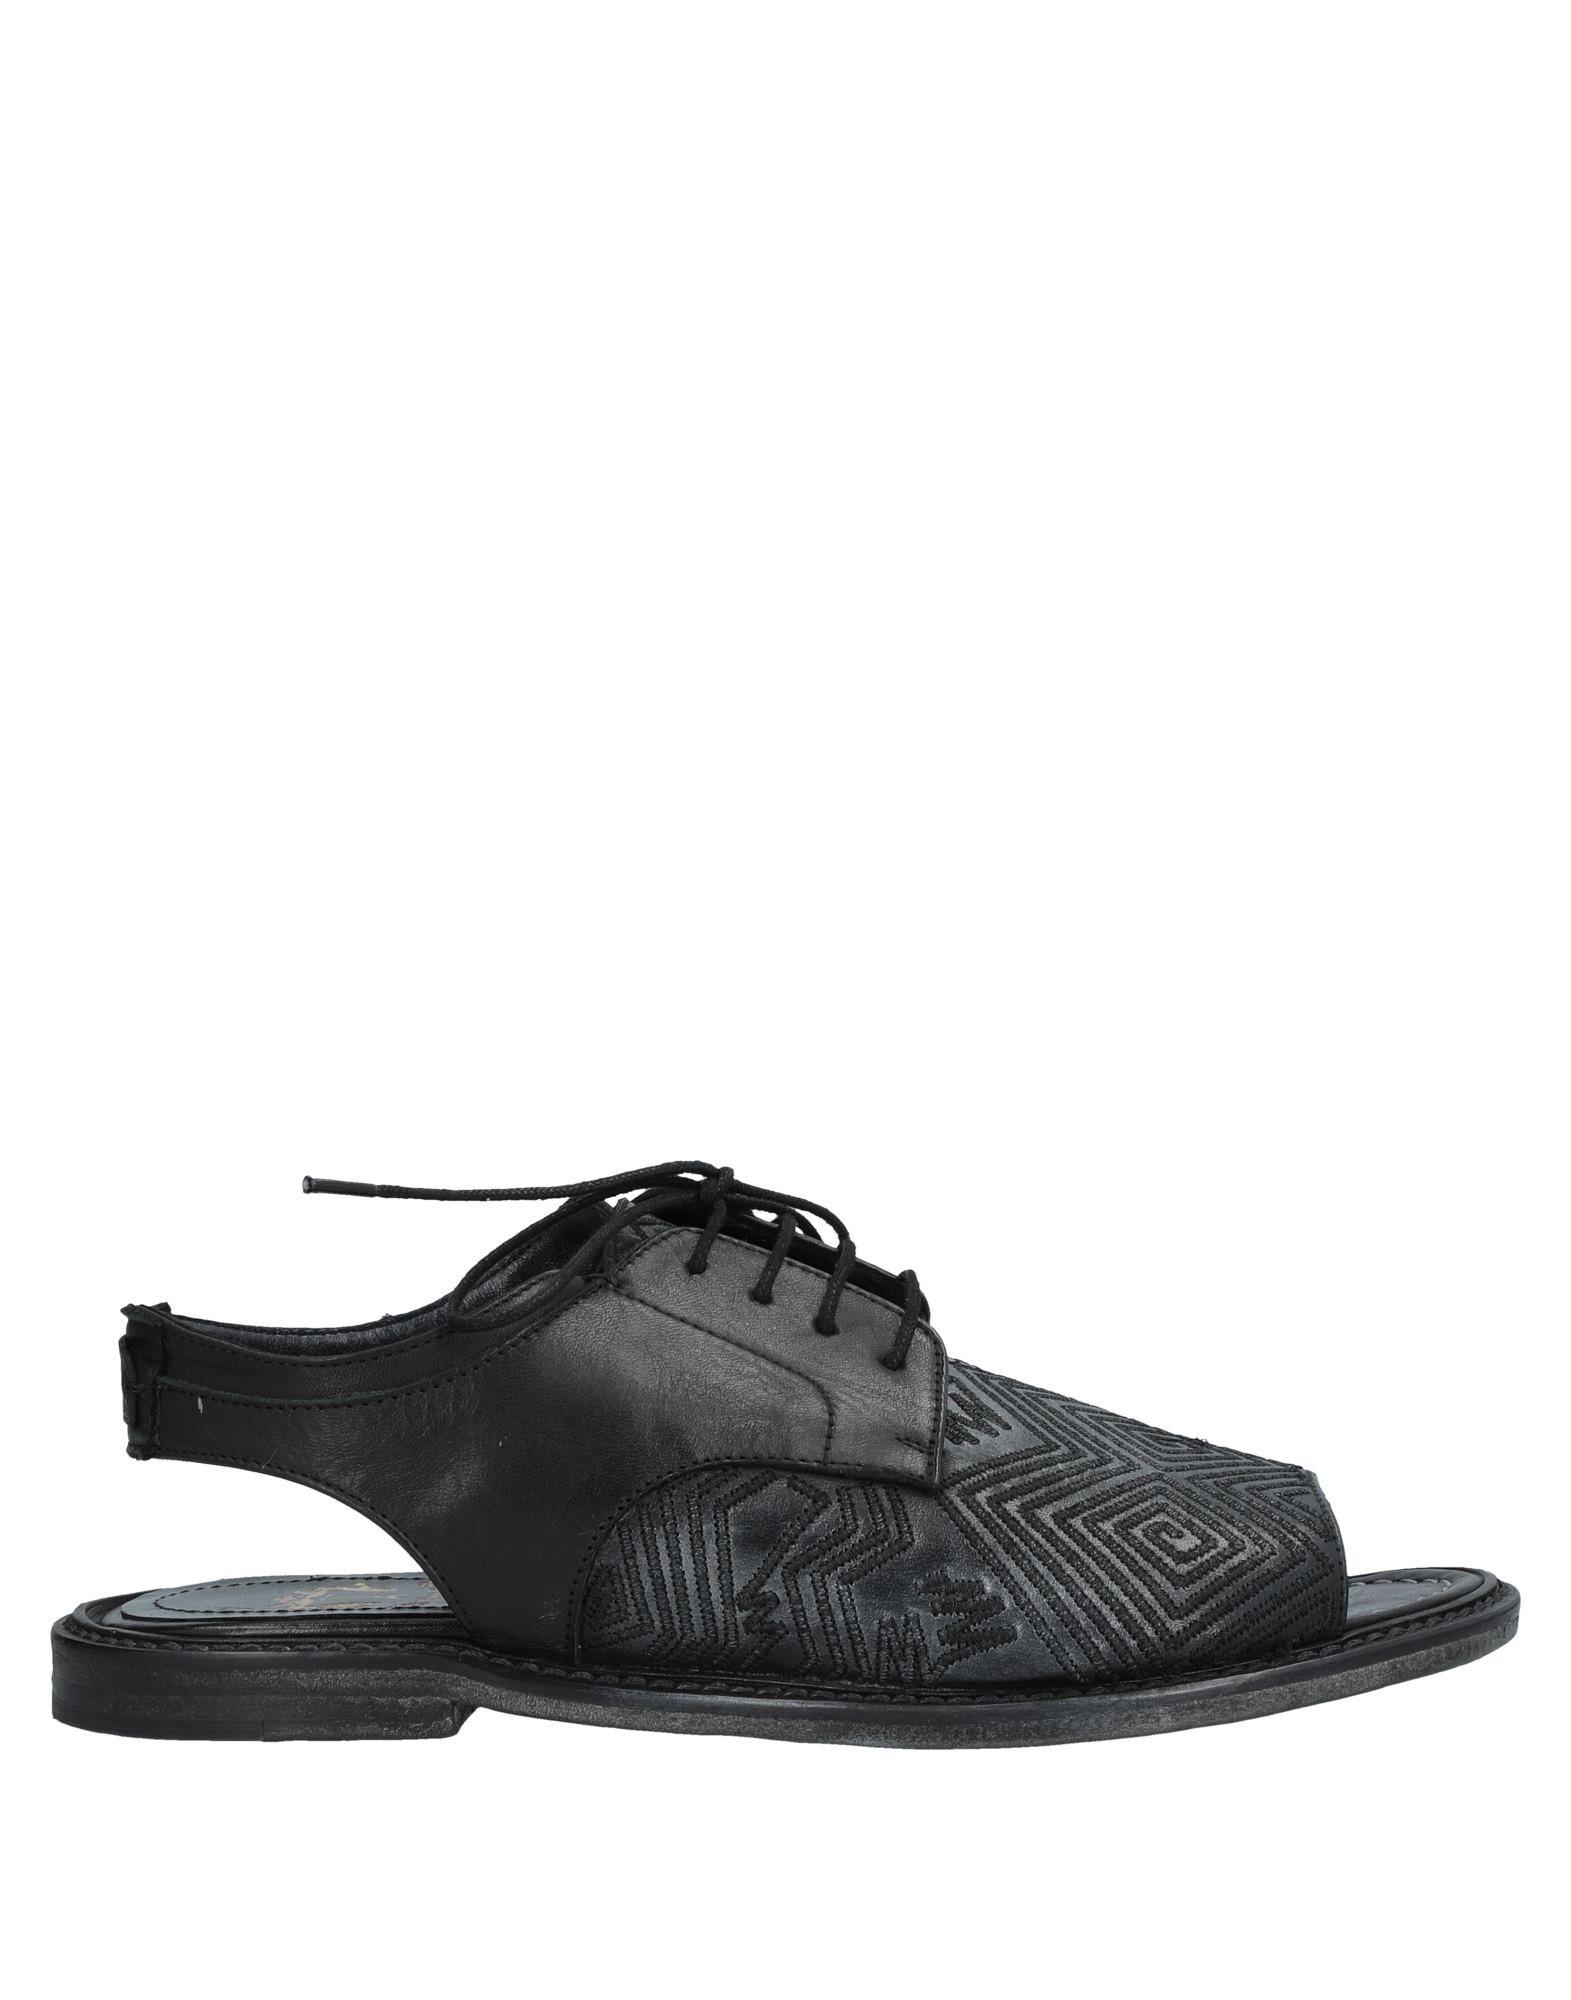 LE RUEMARCEL Sandals in Steel Grey